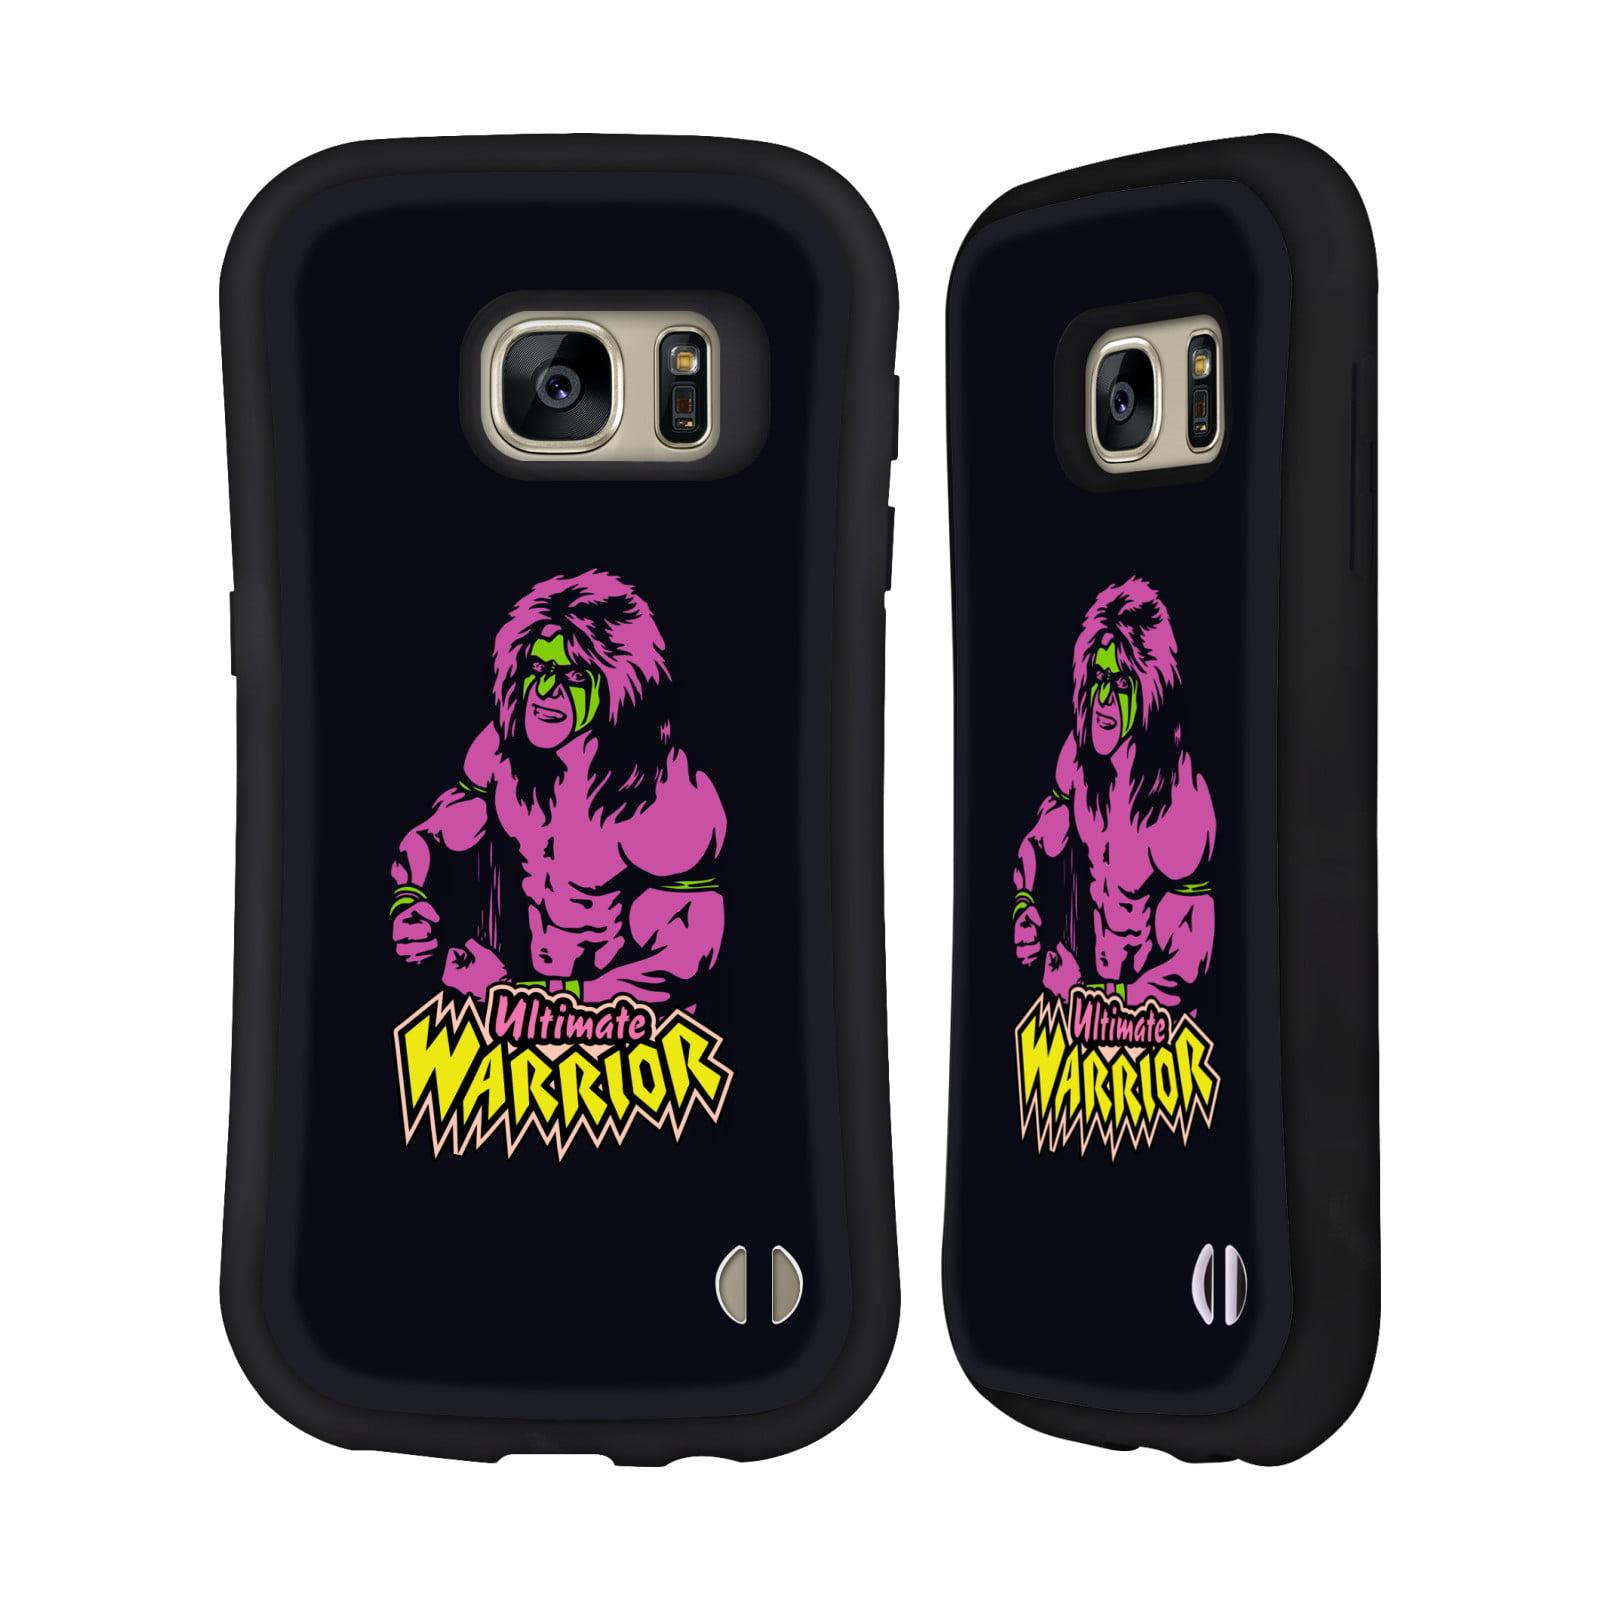 OFFICIAL WWE ULTIMATE WARRIOR HYBRID CASE FOR SAMSUNG PHONES